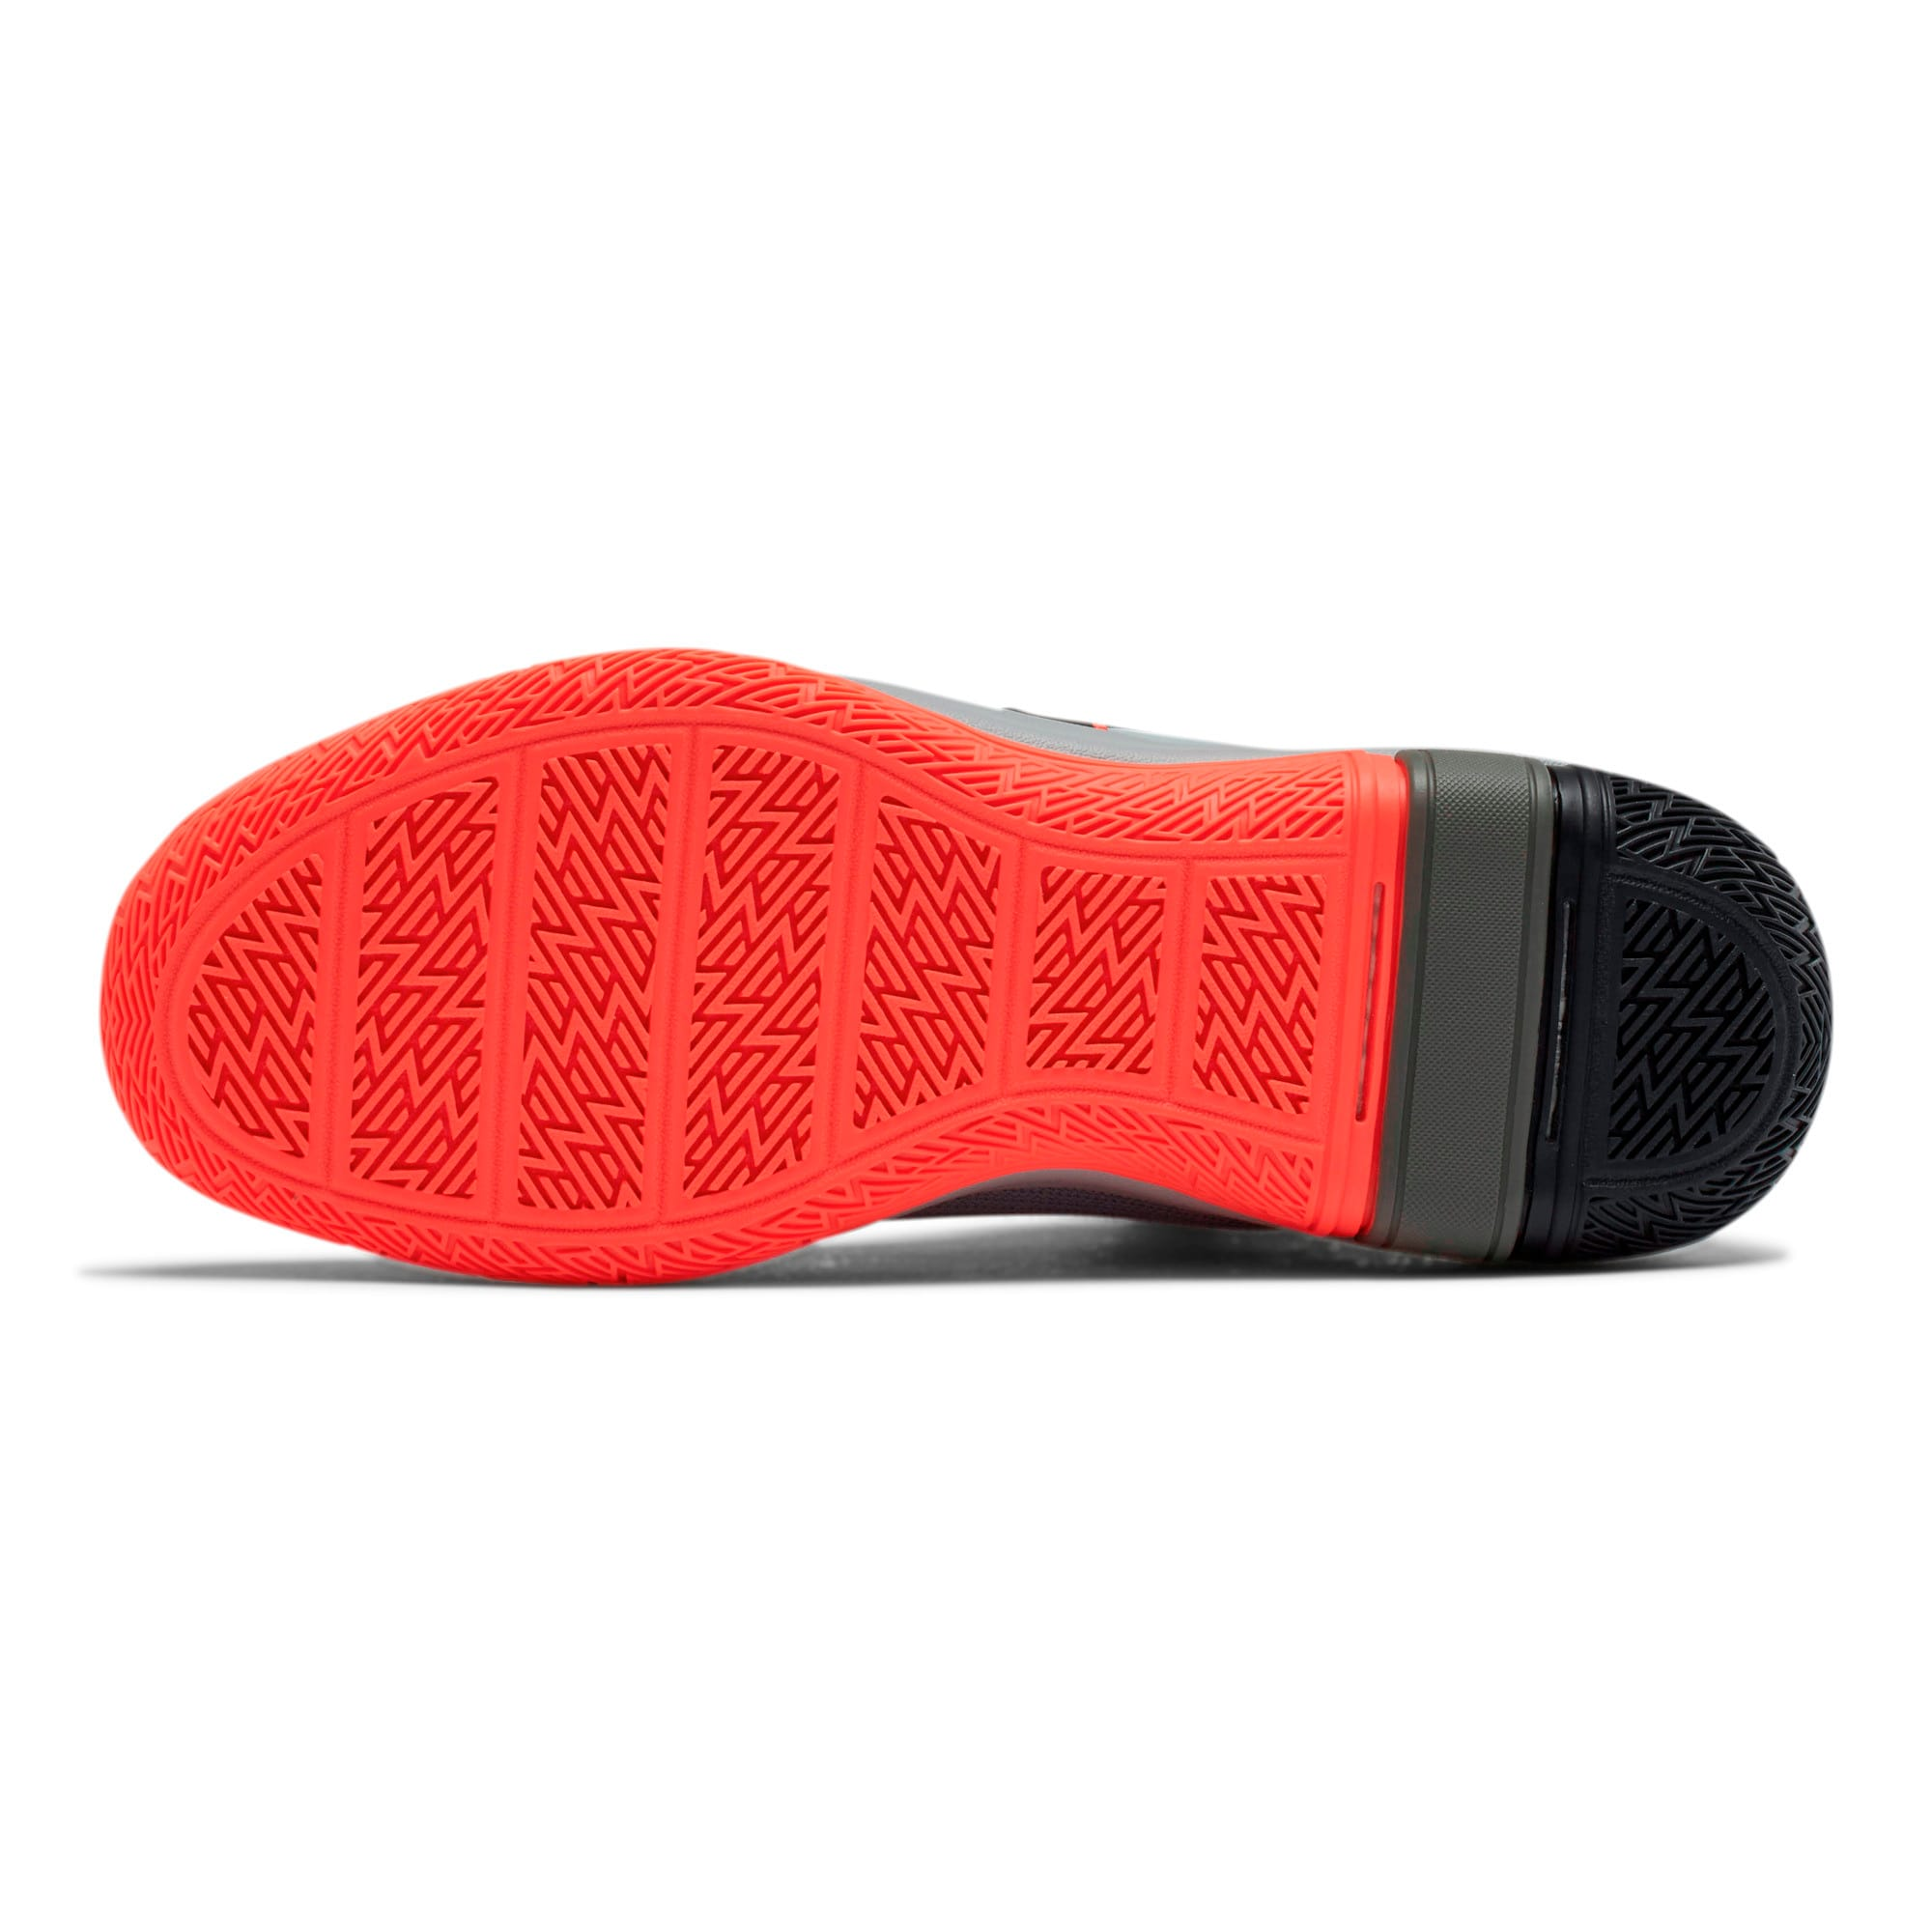 Thumbnail 4 of Legacy Disrupt Basketball Shoes, Puma Black-Red Blast, medium